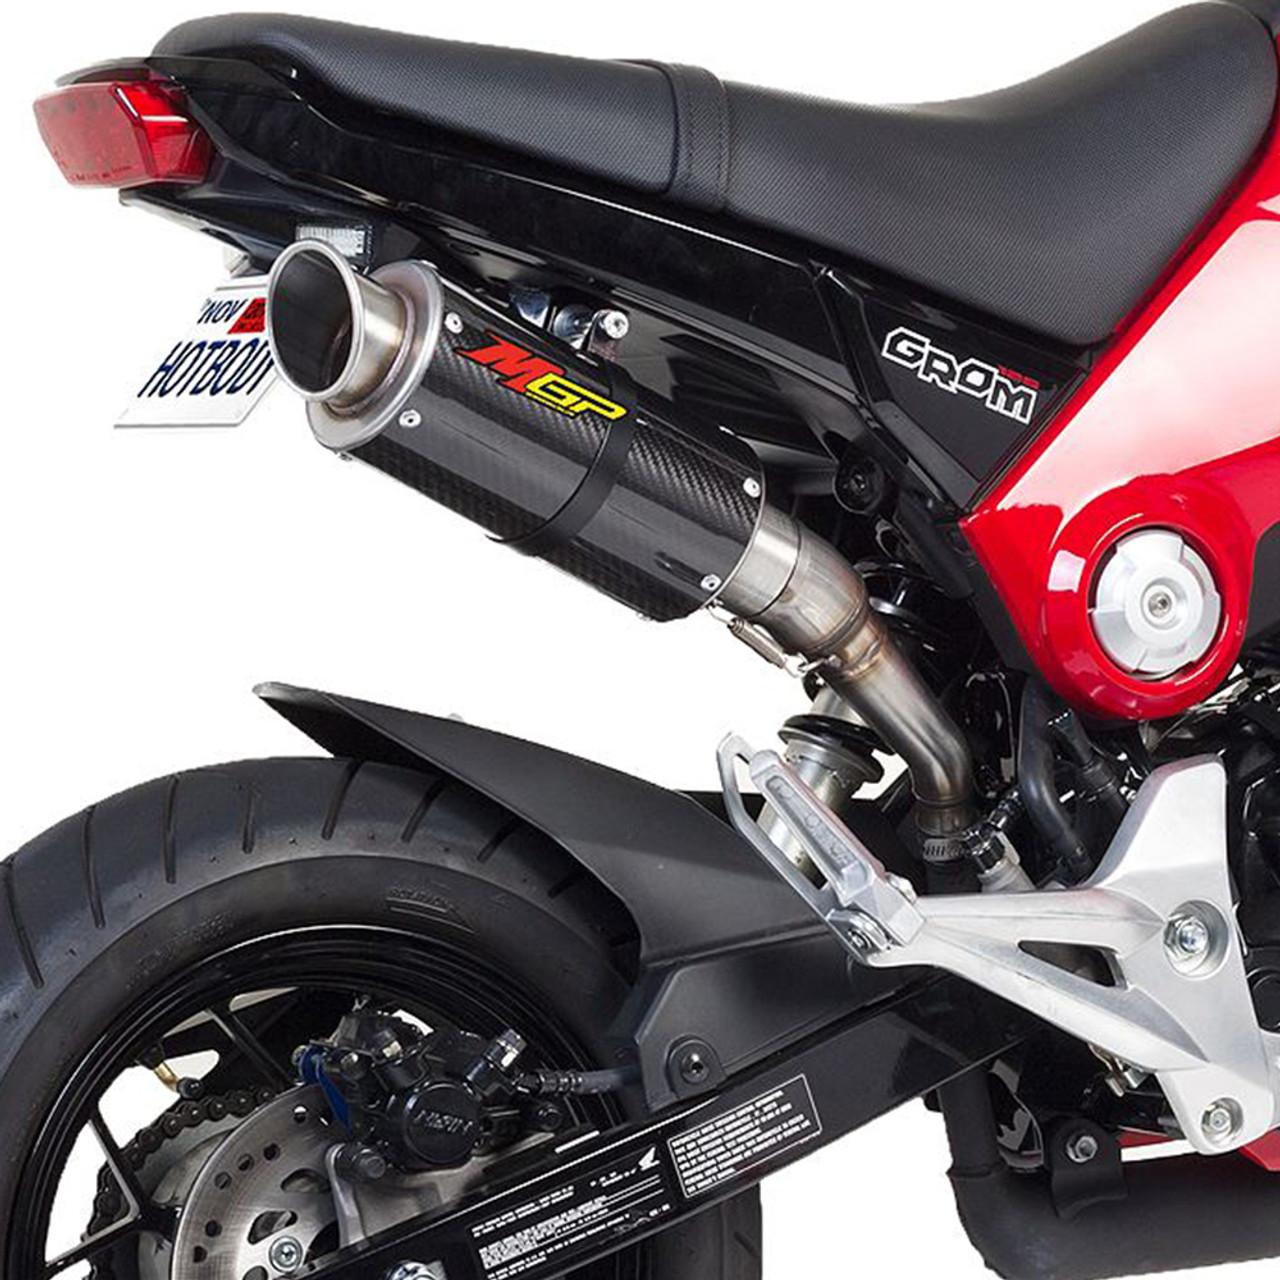 Hotbodies Racing Honda Grom 13-15 MGP Growler Slip-On Exhaust